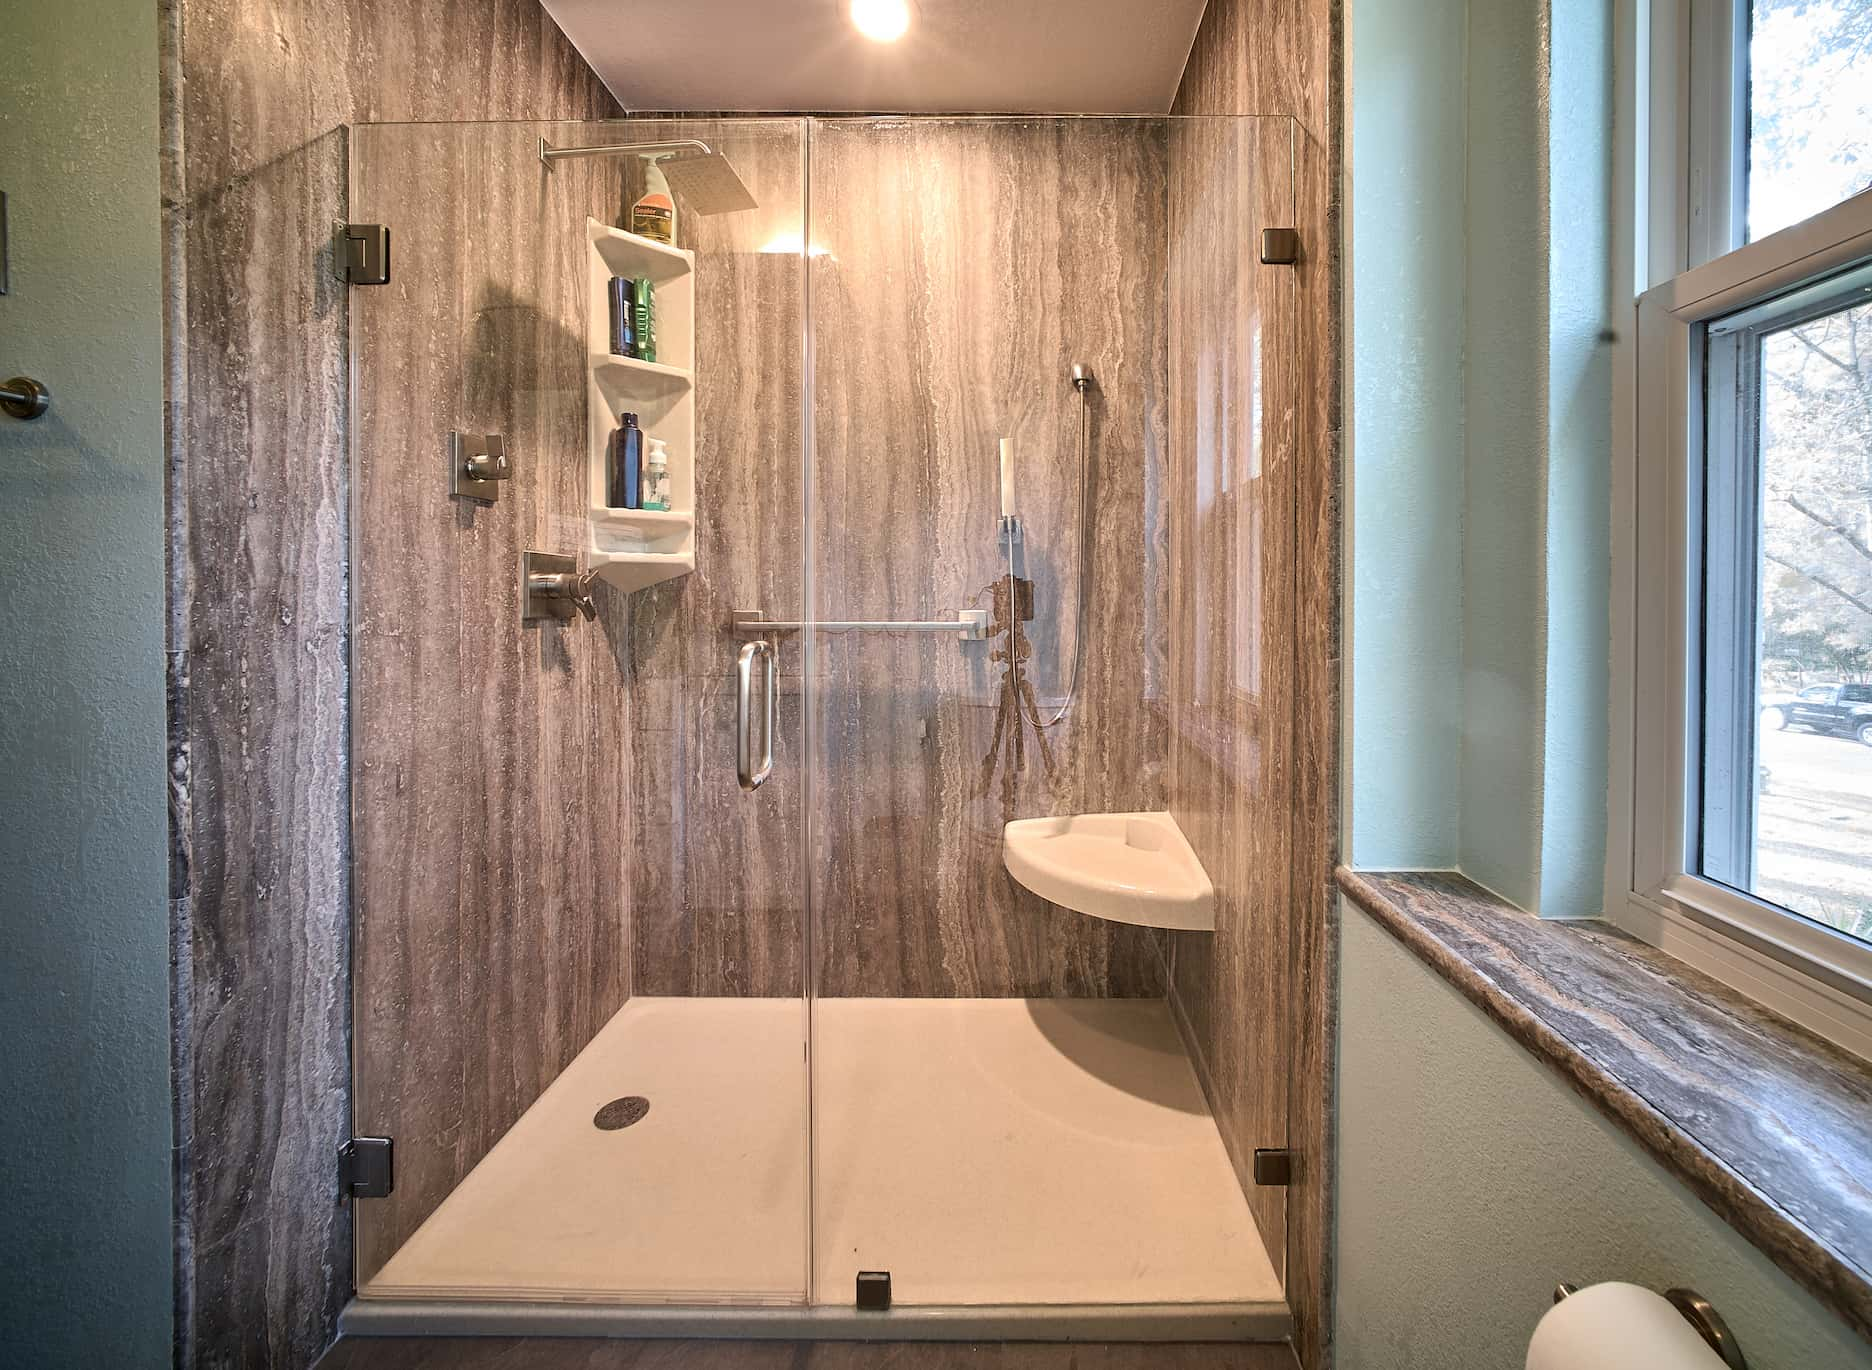 Tub To Shower Conversion Using Silver Veincut Travertine